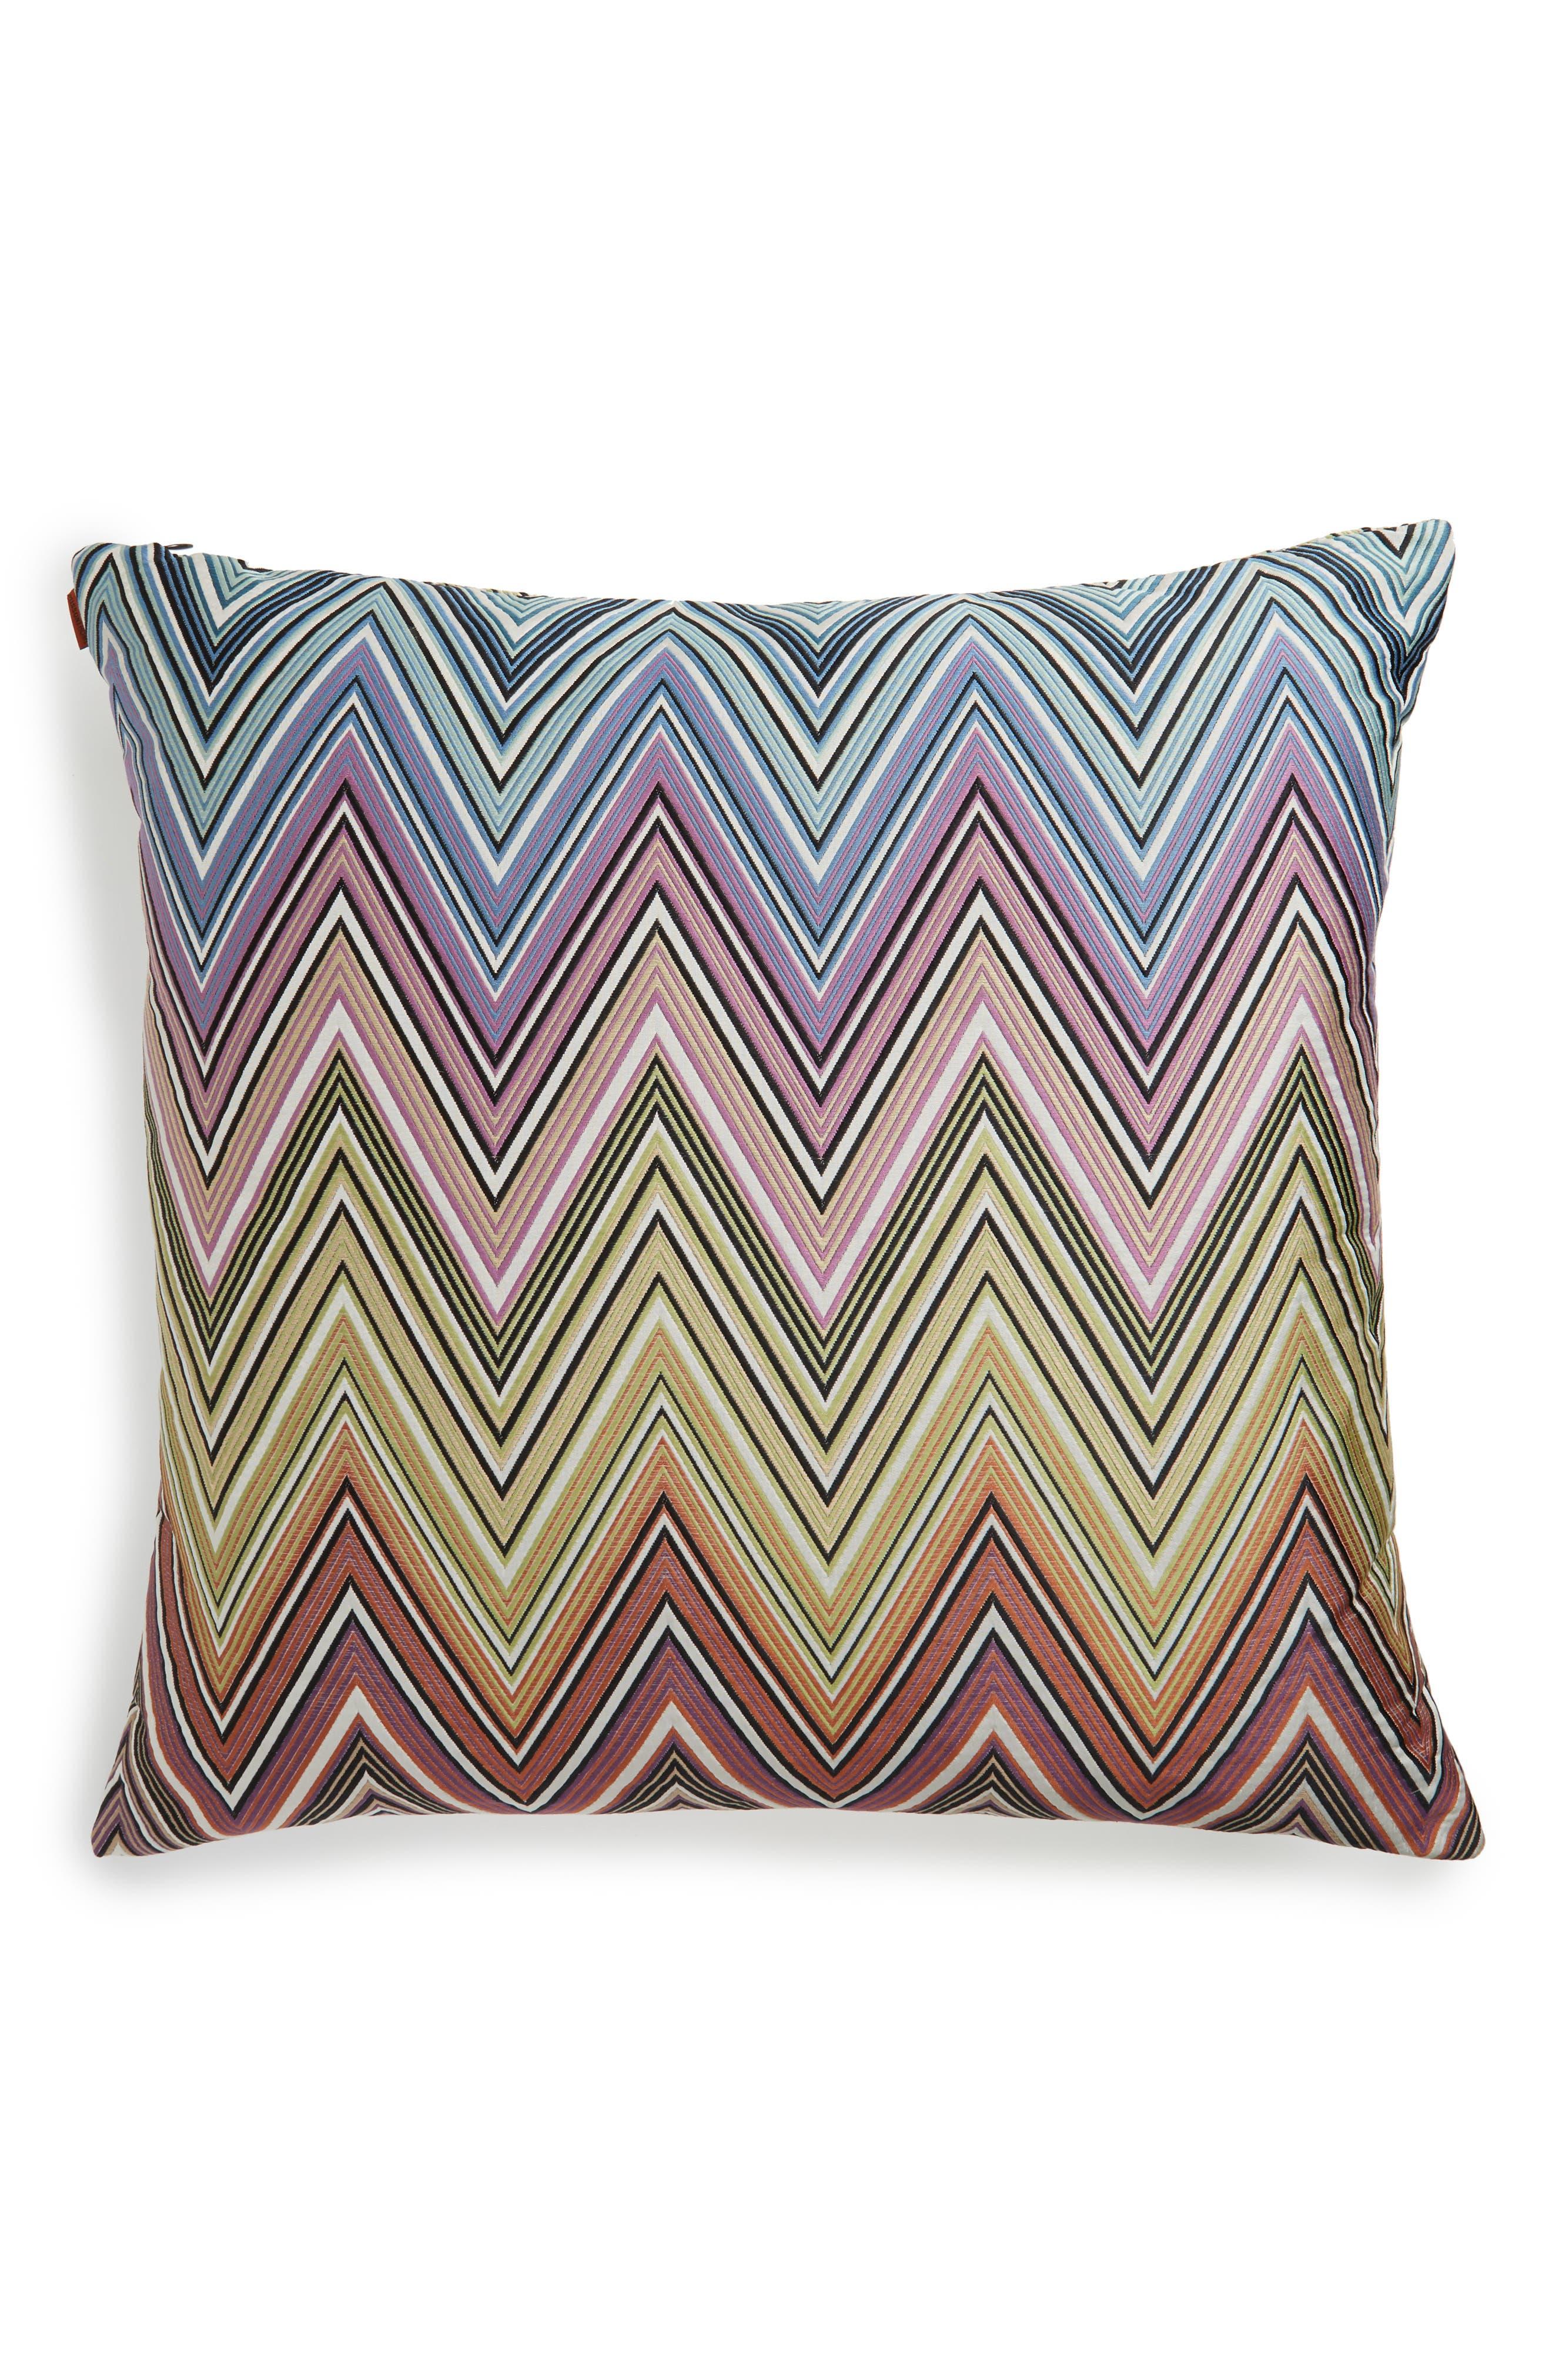 Kew Accent Pillow,                         Main,                         color,